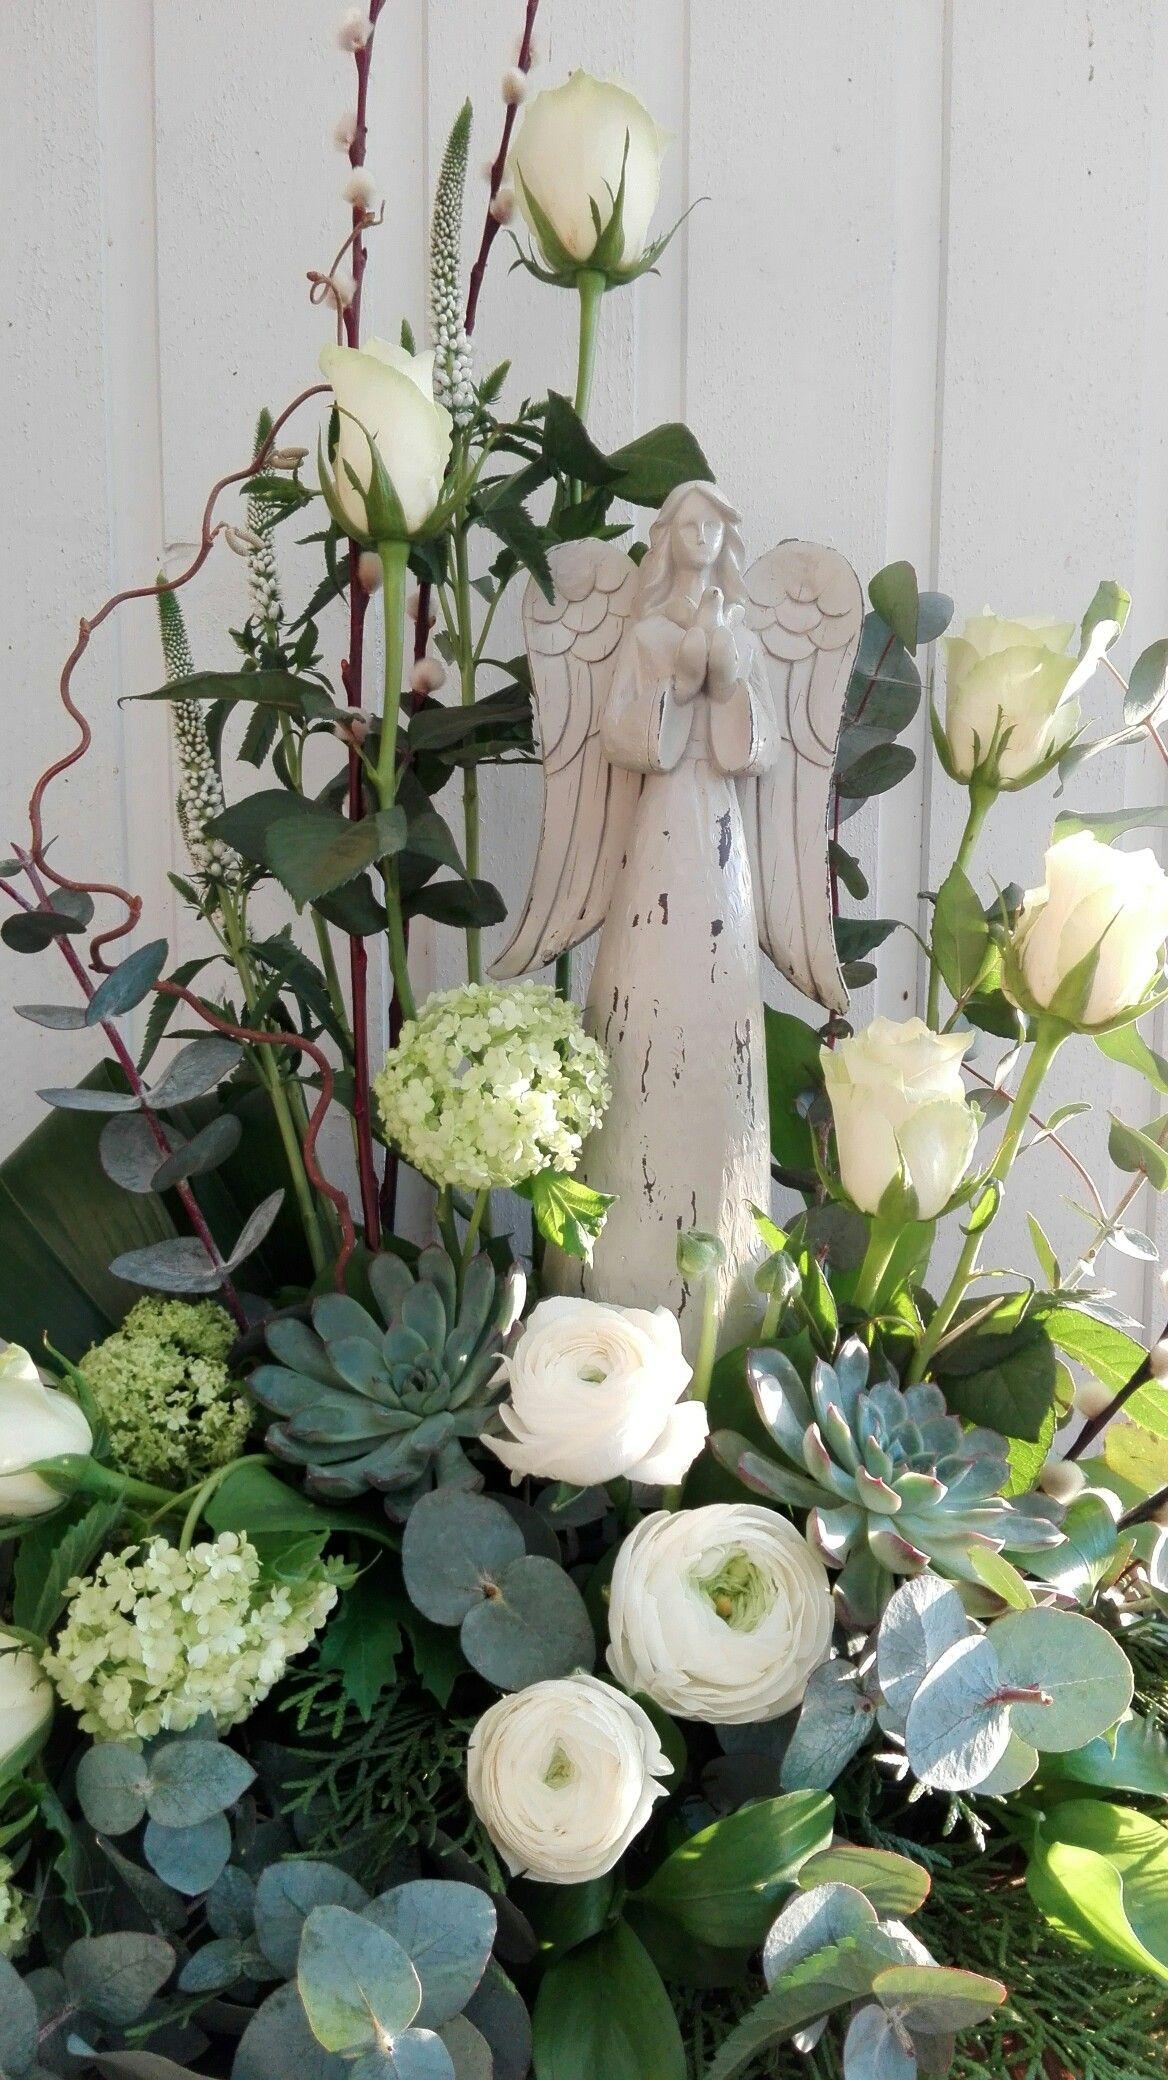 Begravningsdekoration med antik ngel begravningsdekoraton blommor begravningsdekoration med antik ngel begravningsdekoraton blommor ngel funeral flowers angel izmirmasajfo